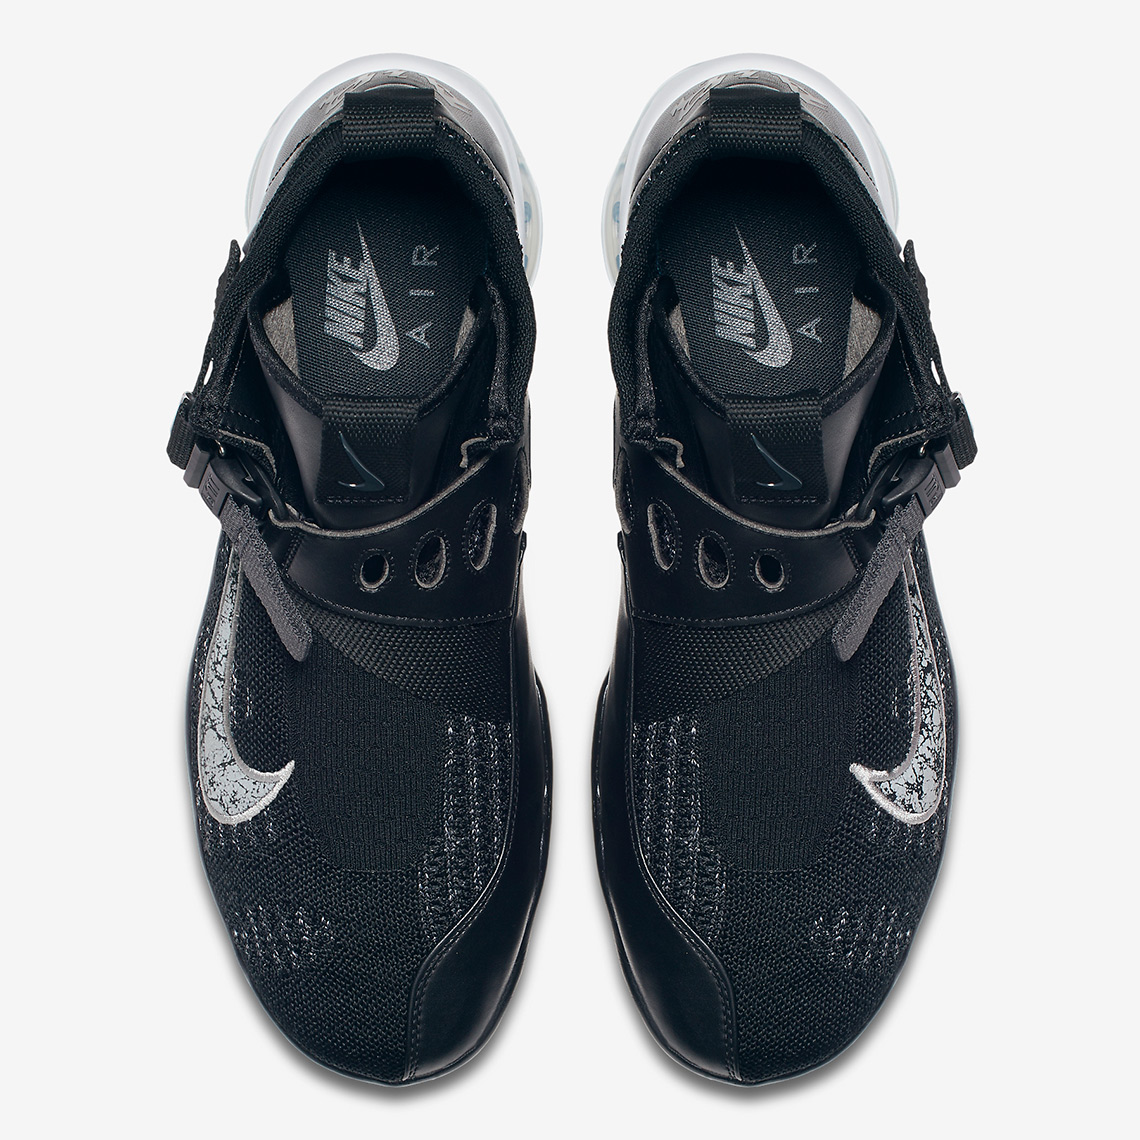 f781b9505722 Nike VaporMax Premier Flyknit Color  Wolf Grey Metallic Silver-Black Style  Code  AO3241-001. Advertisement